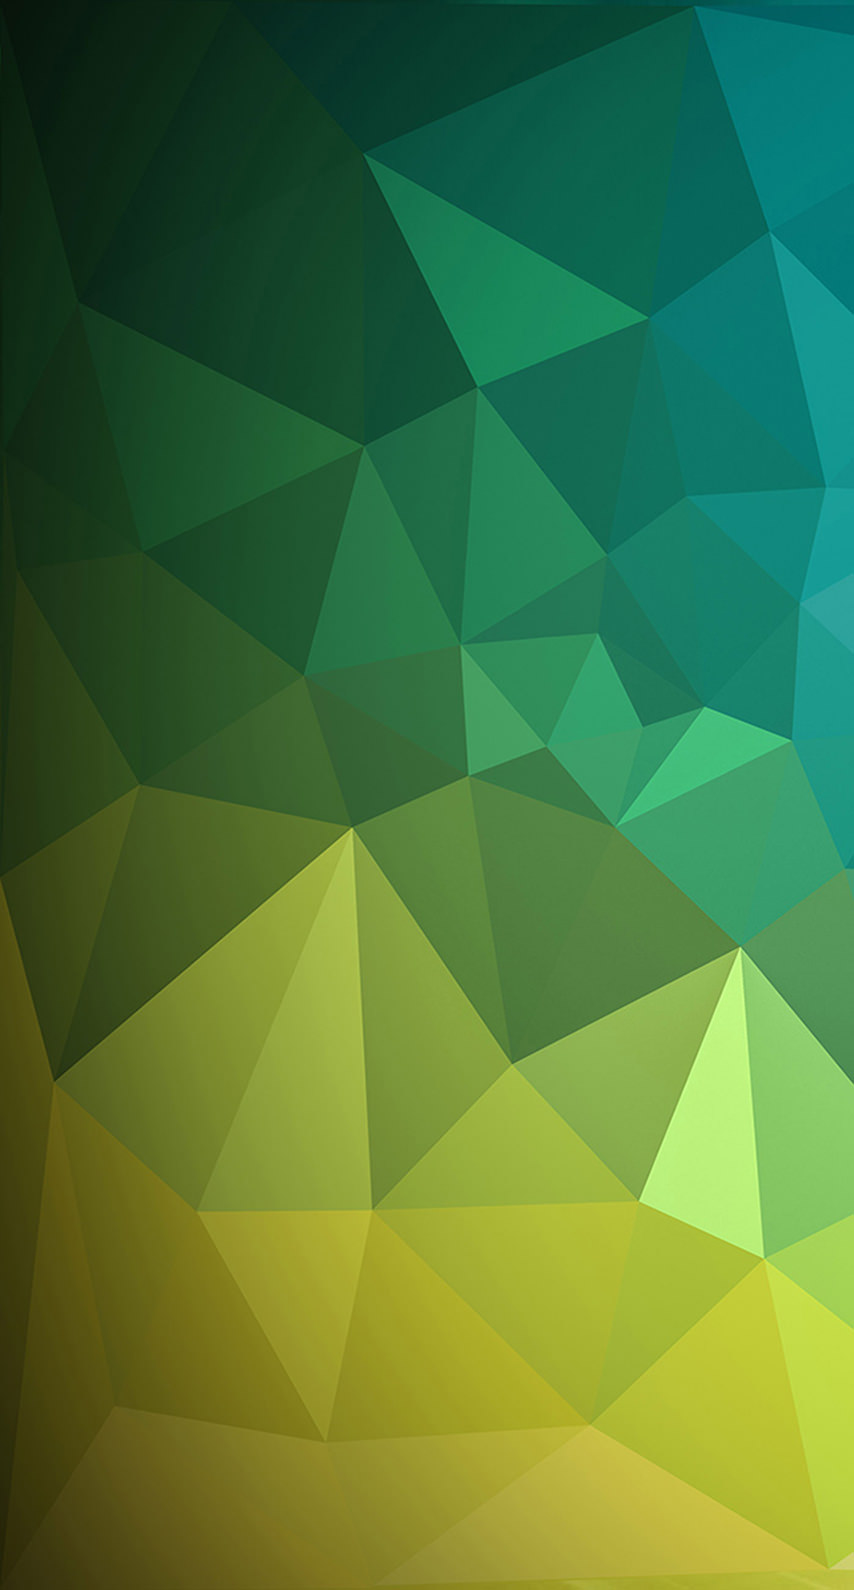 Green patterned wallpaper